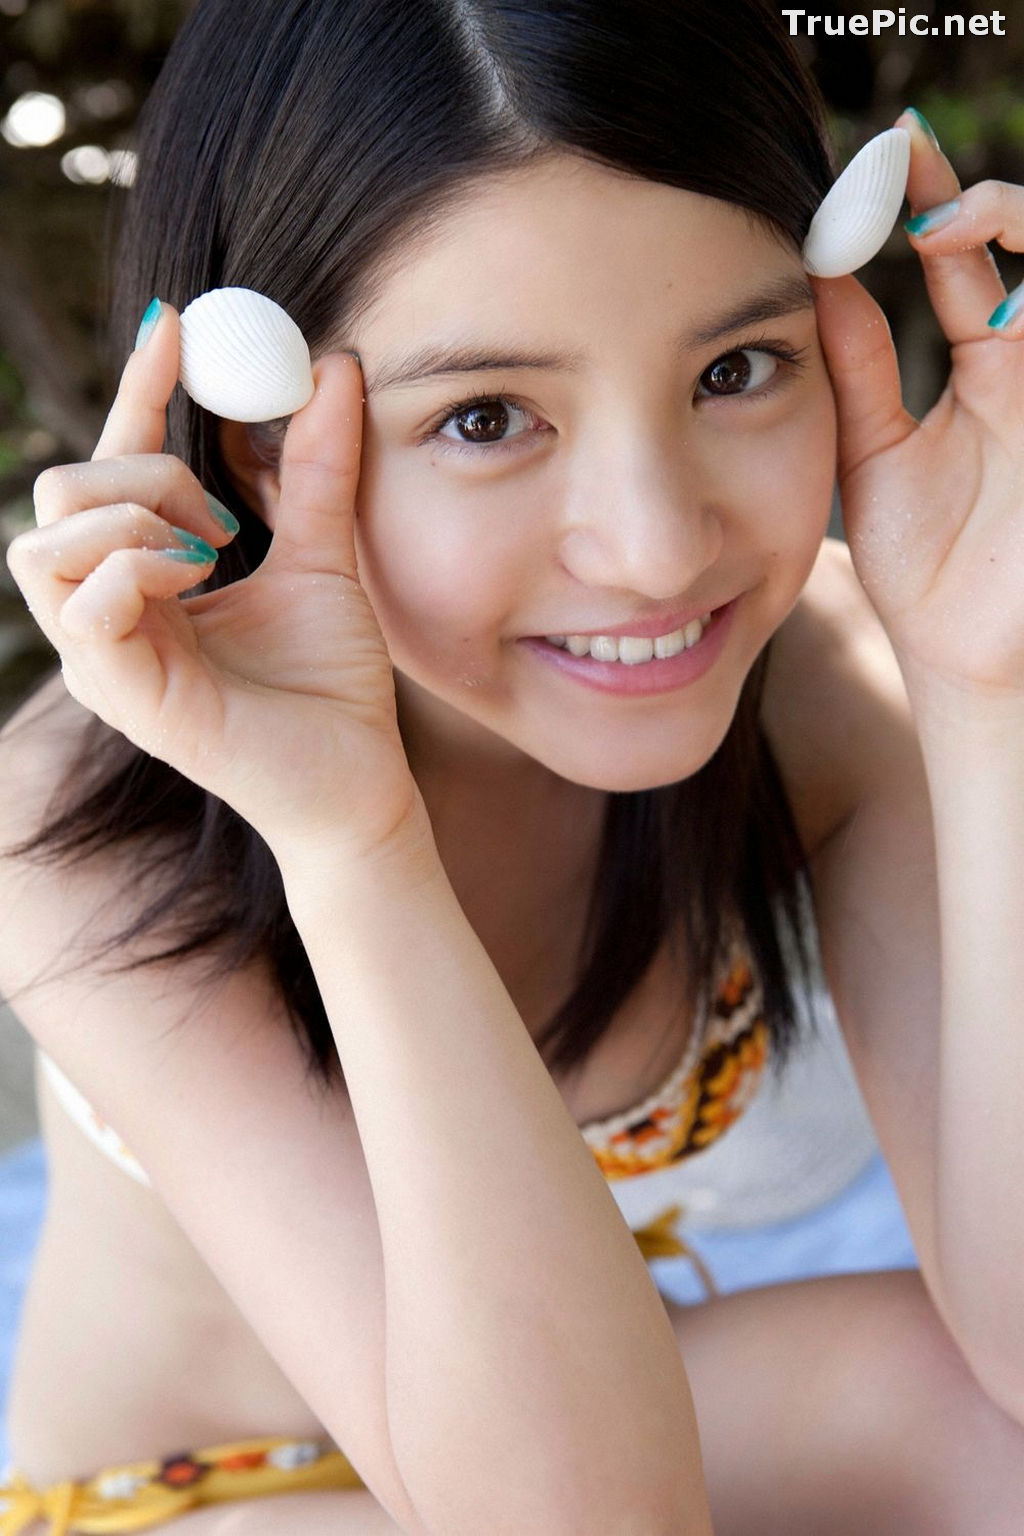 Image [YS Web] Vol.506 - Japanese Actress and Singer - Umika Kawashima - TruePic.net - Picture-21